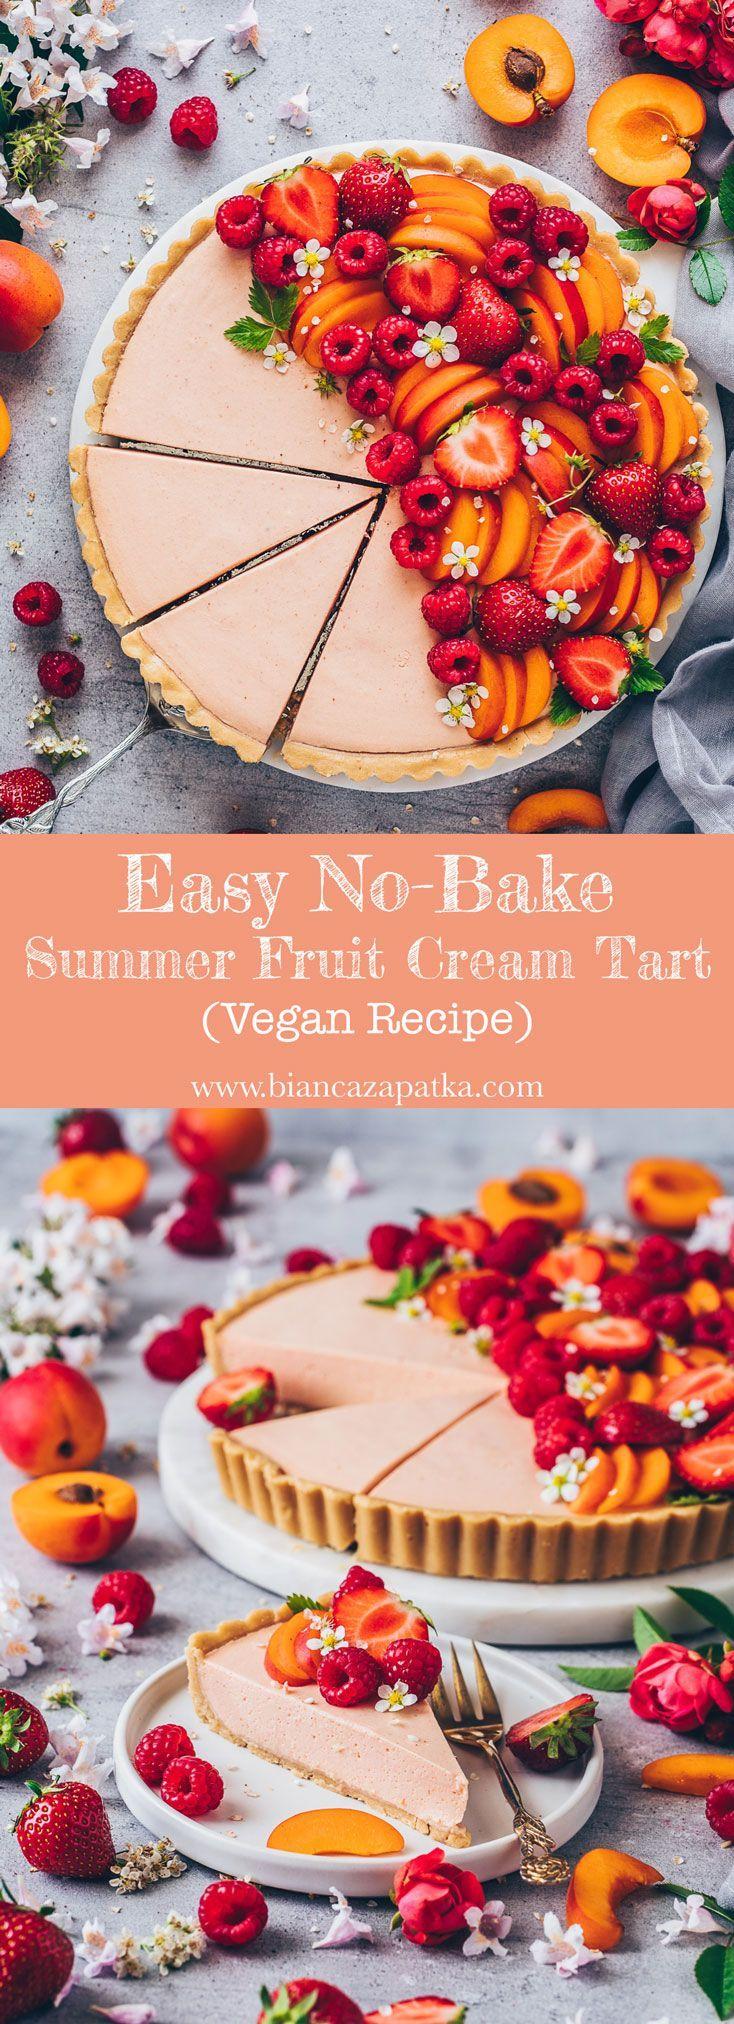 Summer Fruit Cream Tart